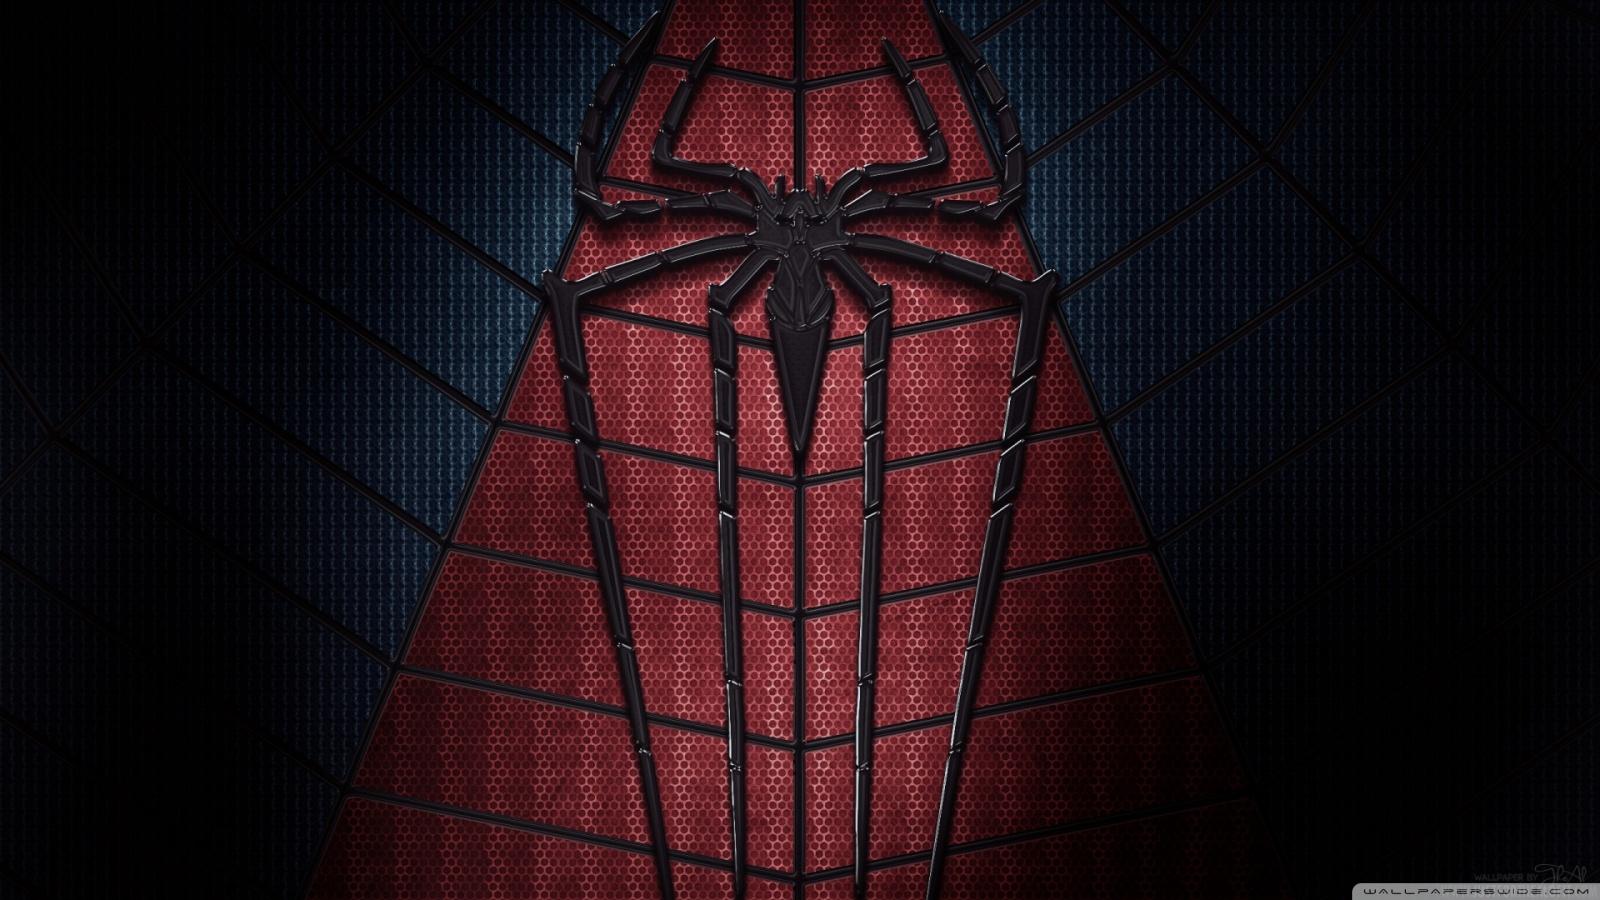 The Amazing Spider-Man 2 (2014) HD desktop wallpaper : High